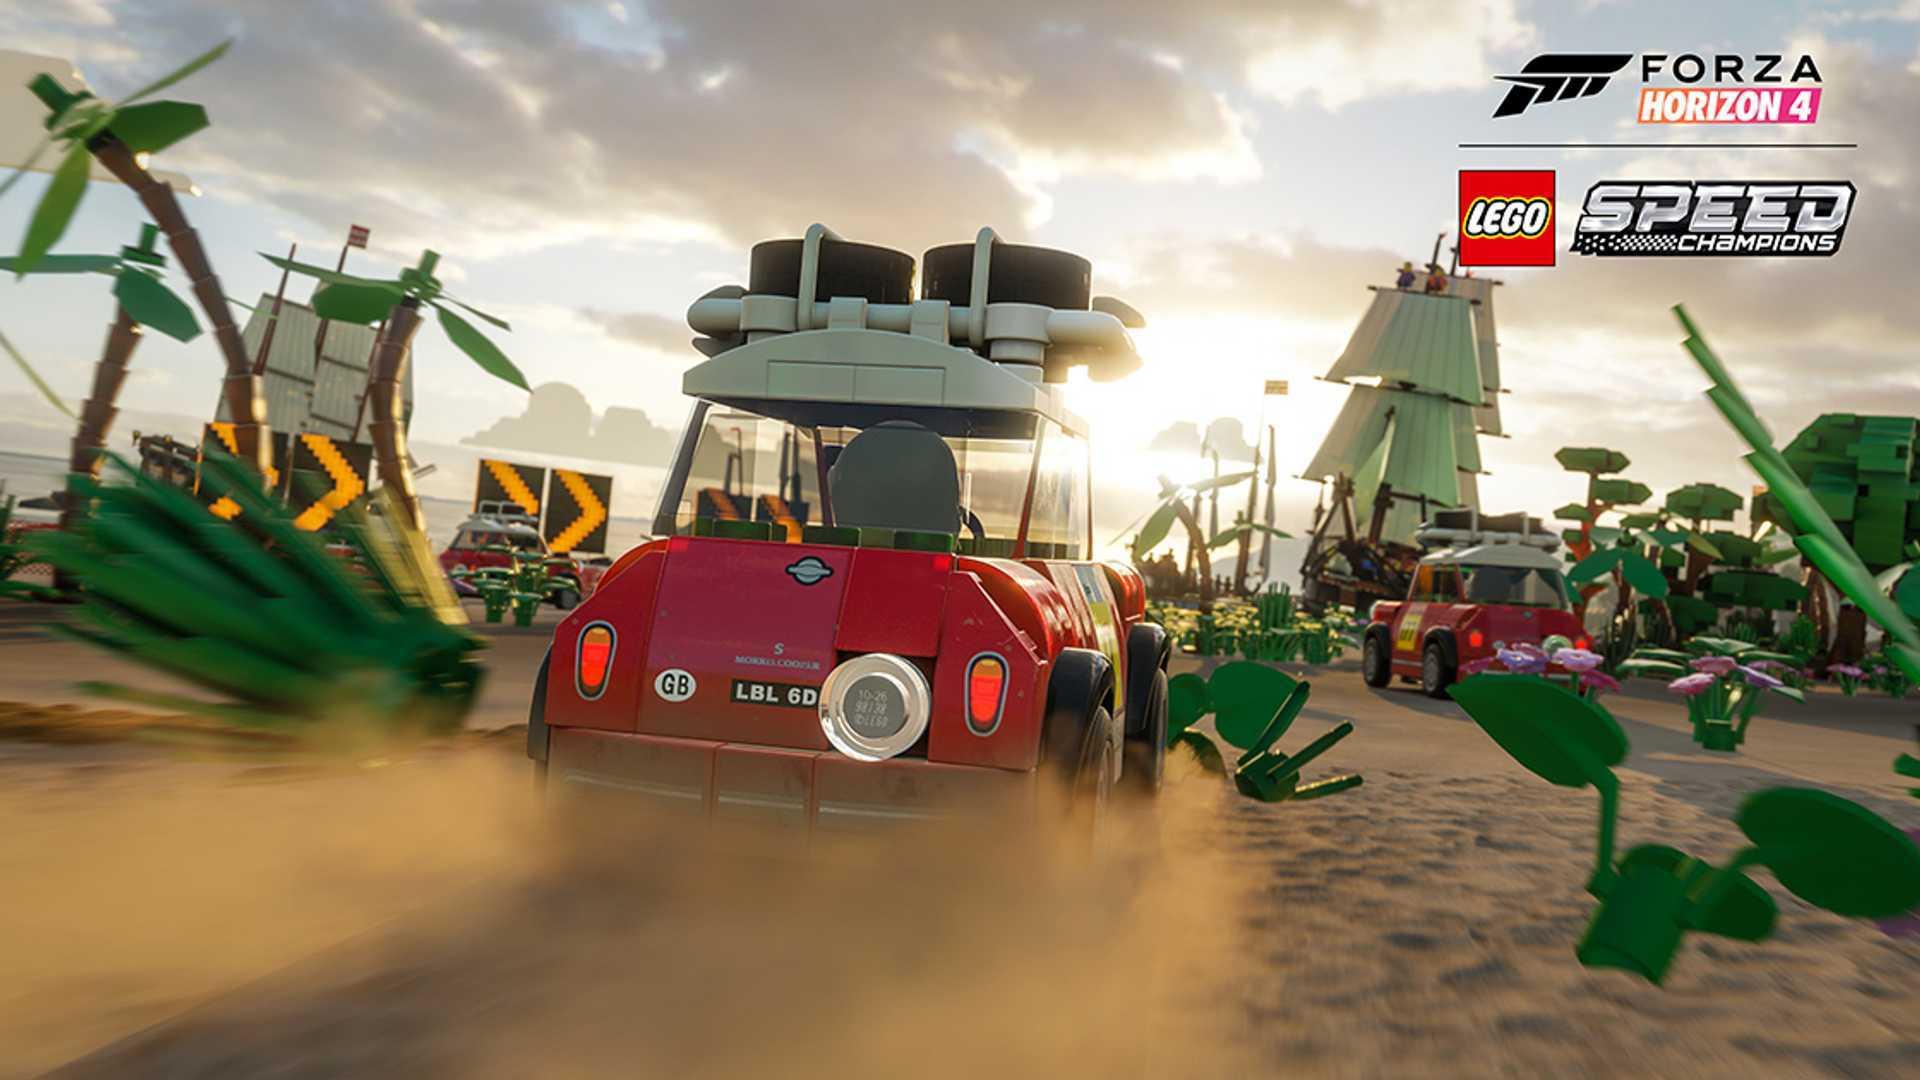 Lego Speed Champions, Rimac C_Two Are Invading Forza Horizon 4